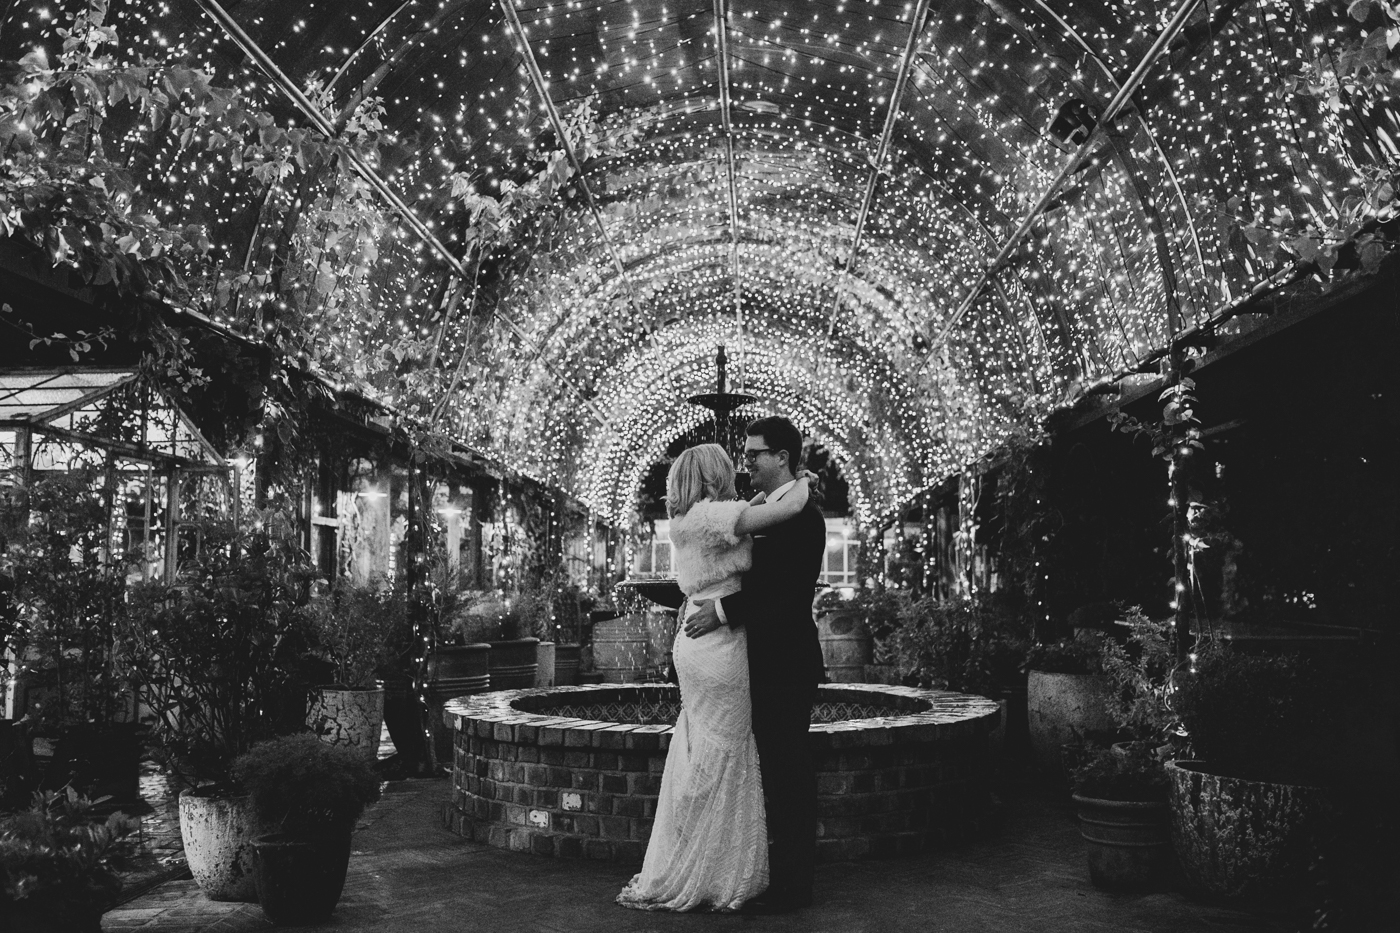 Jo & Tom Wedding - The Grounds of Alexandria - Samantha Heather Photography-344.jpg